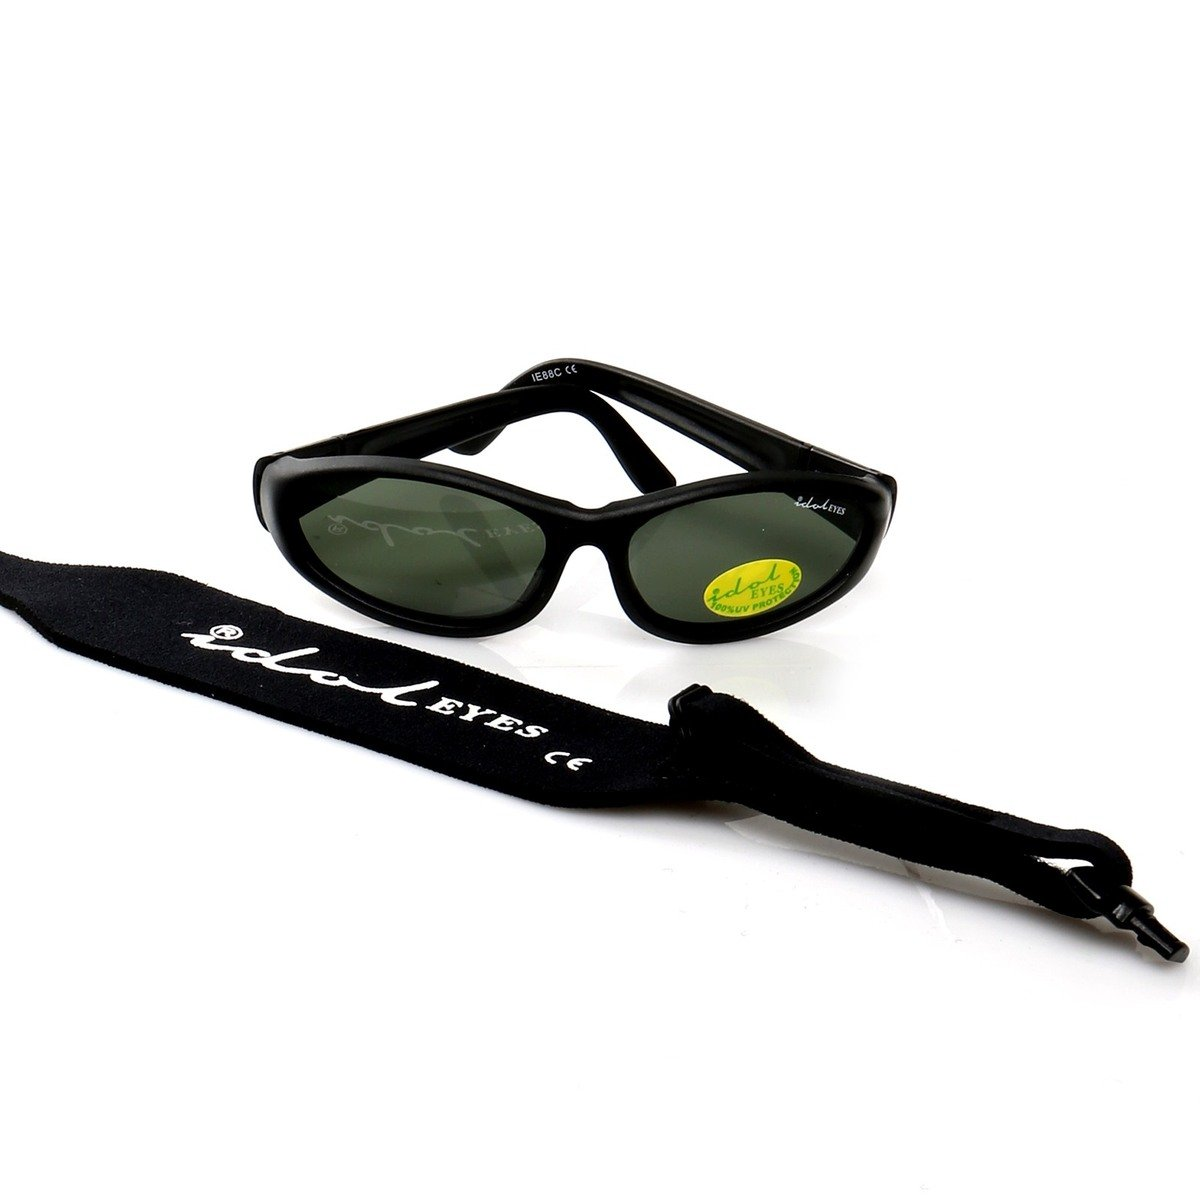 BABY WRAPZ 2 可替換幼兒太陽眼鏡